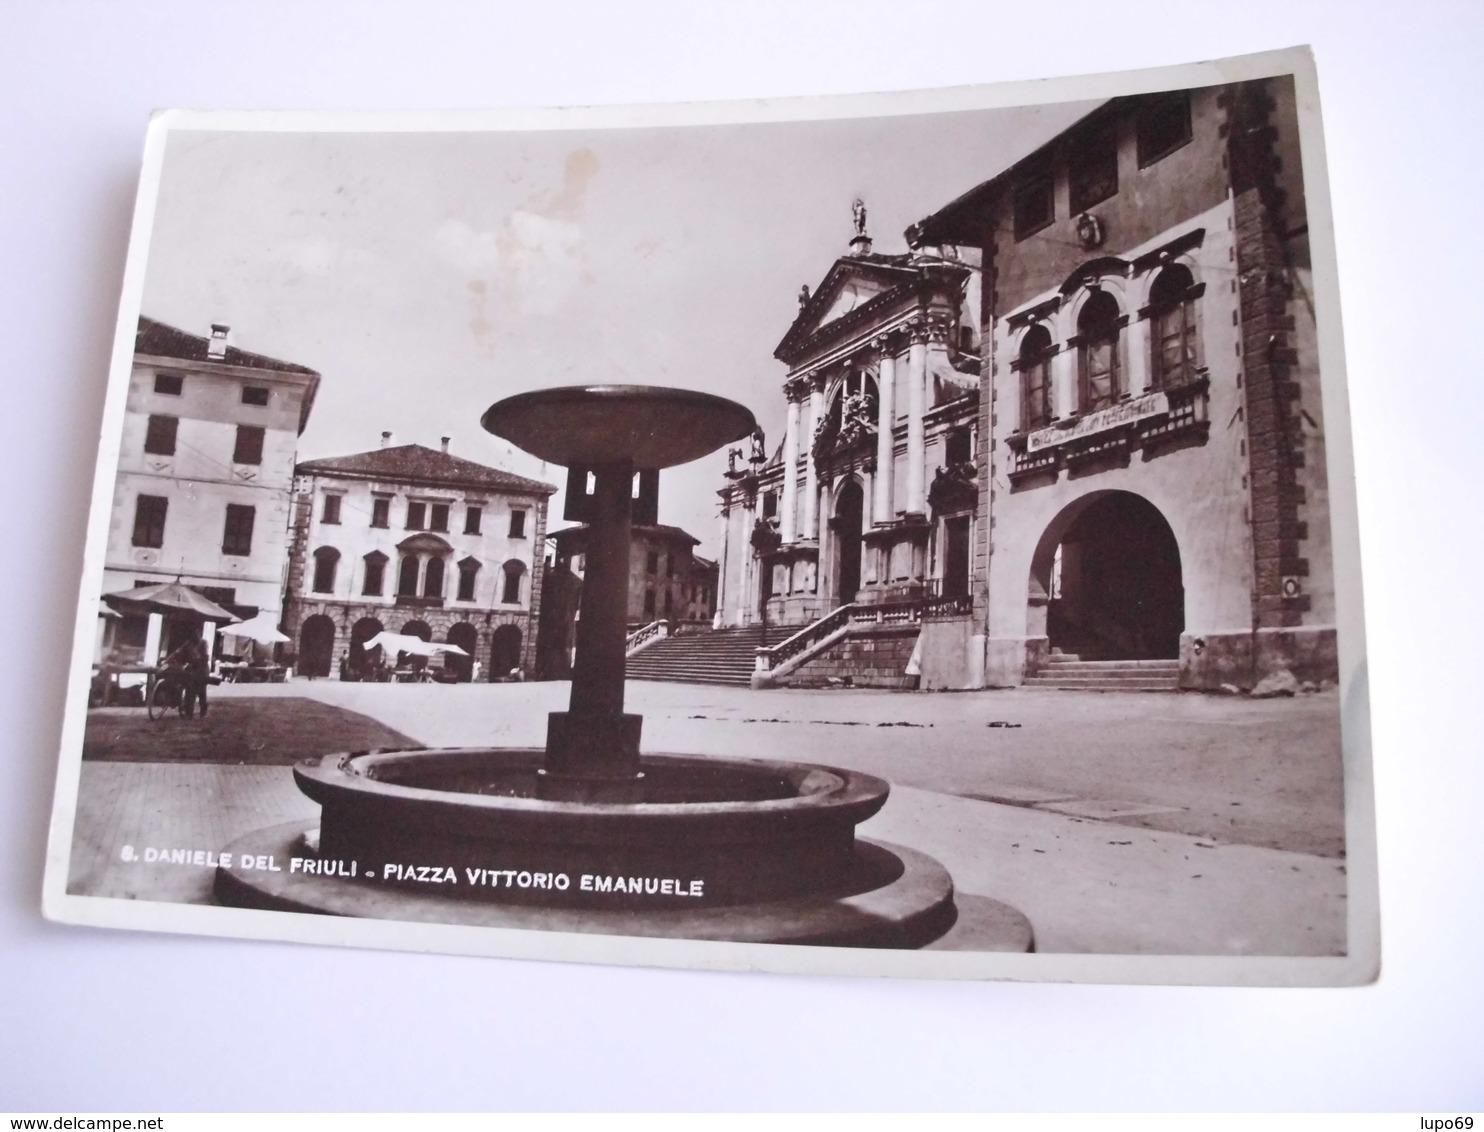 Udine - S. Daniele Del Friuli Piazza Vittorio Emanuele - Udine